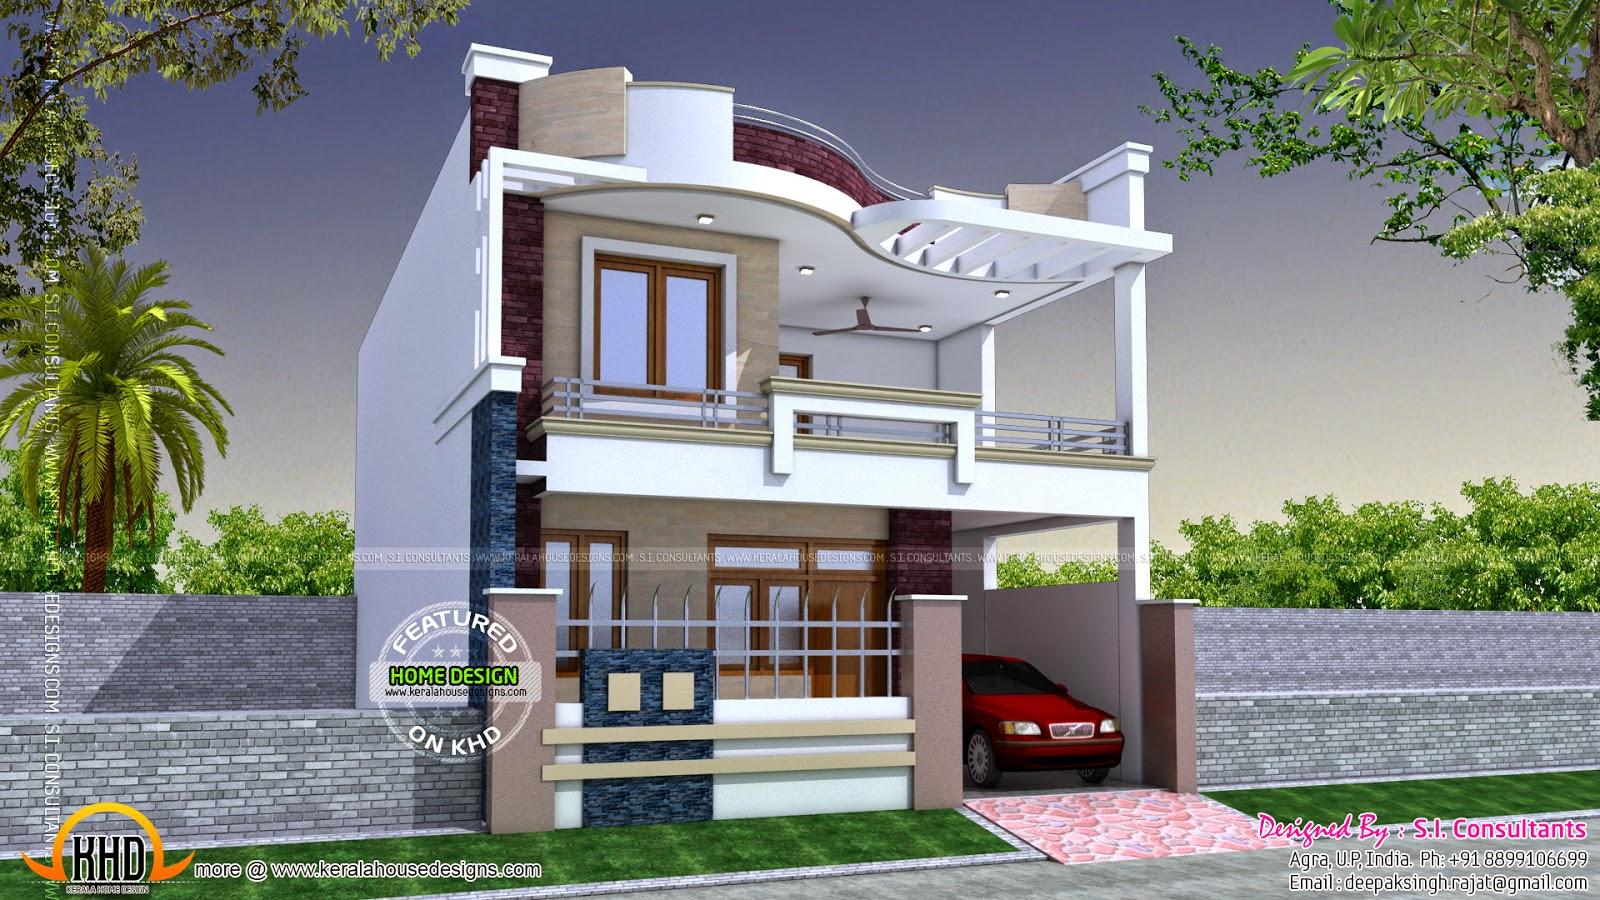 modern indian home design kerala home design floor plans september kerala home design floor plans